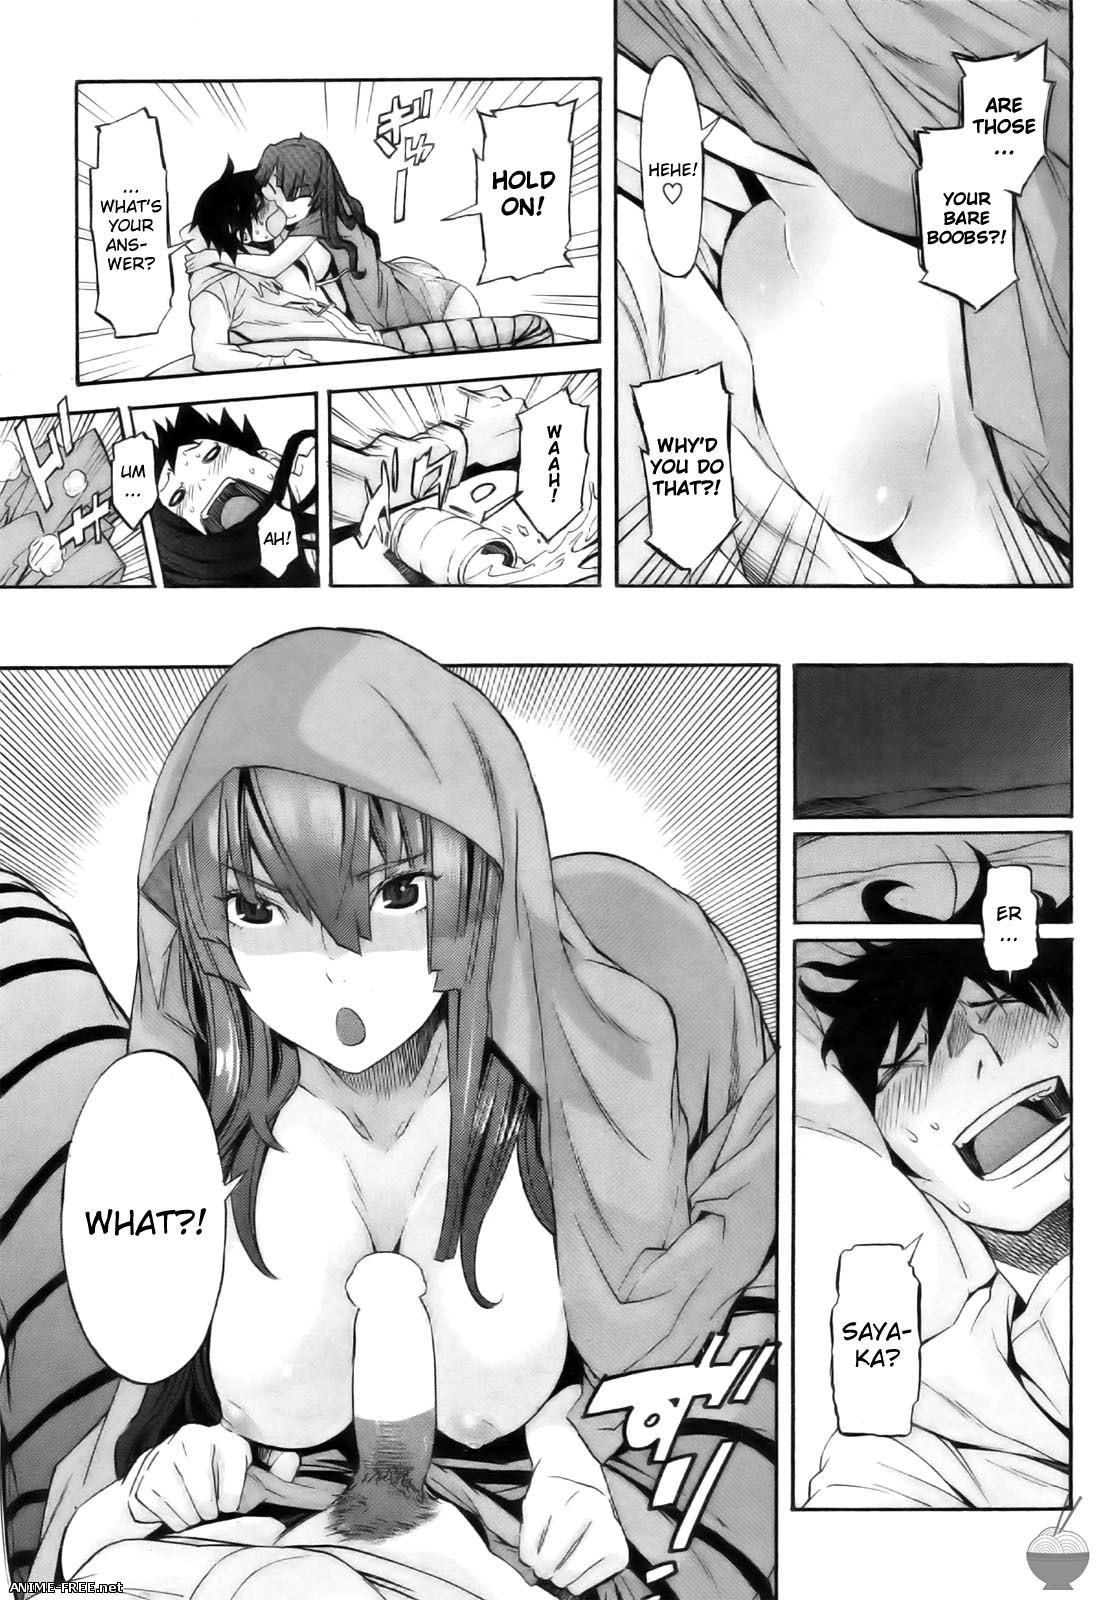 D.P — Poko to Issho и другие работы [Ptcen] [RUS,ENG,JAP] Manga Hentai